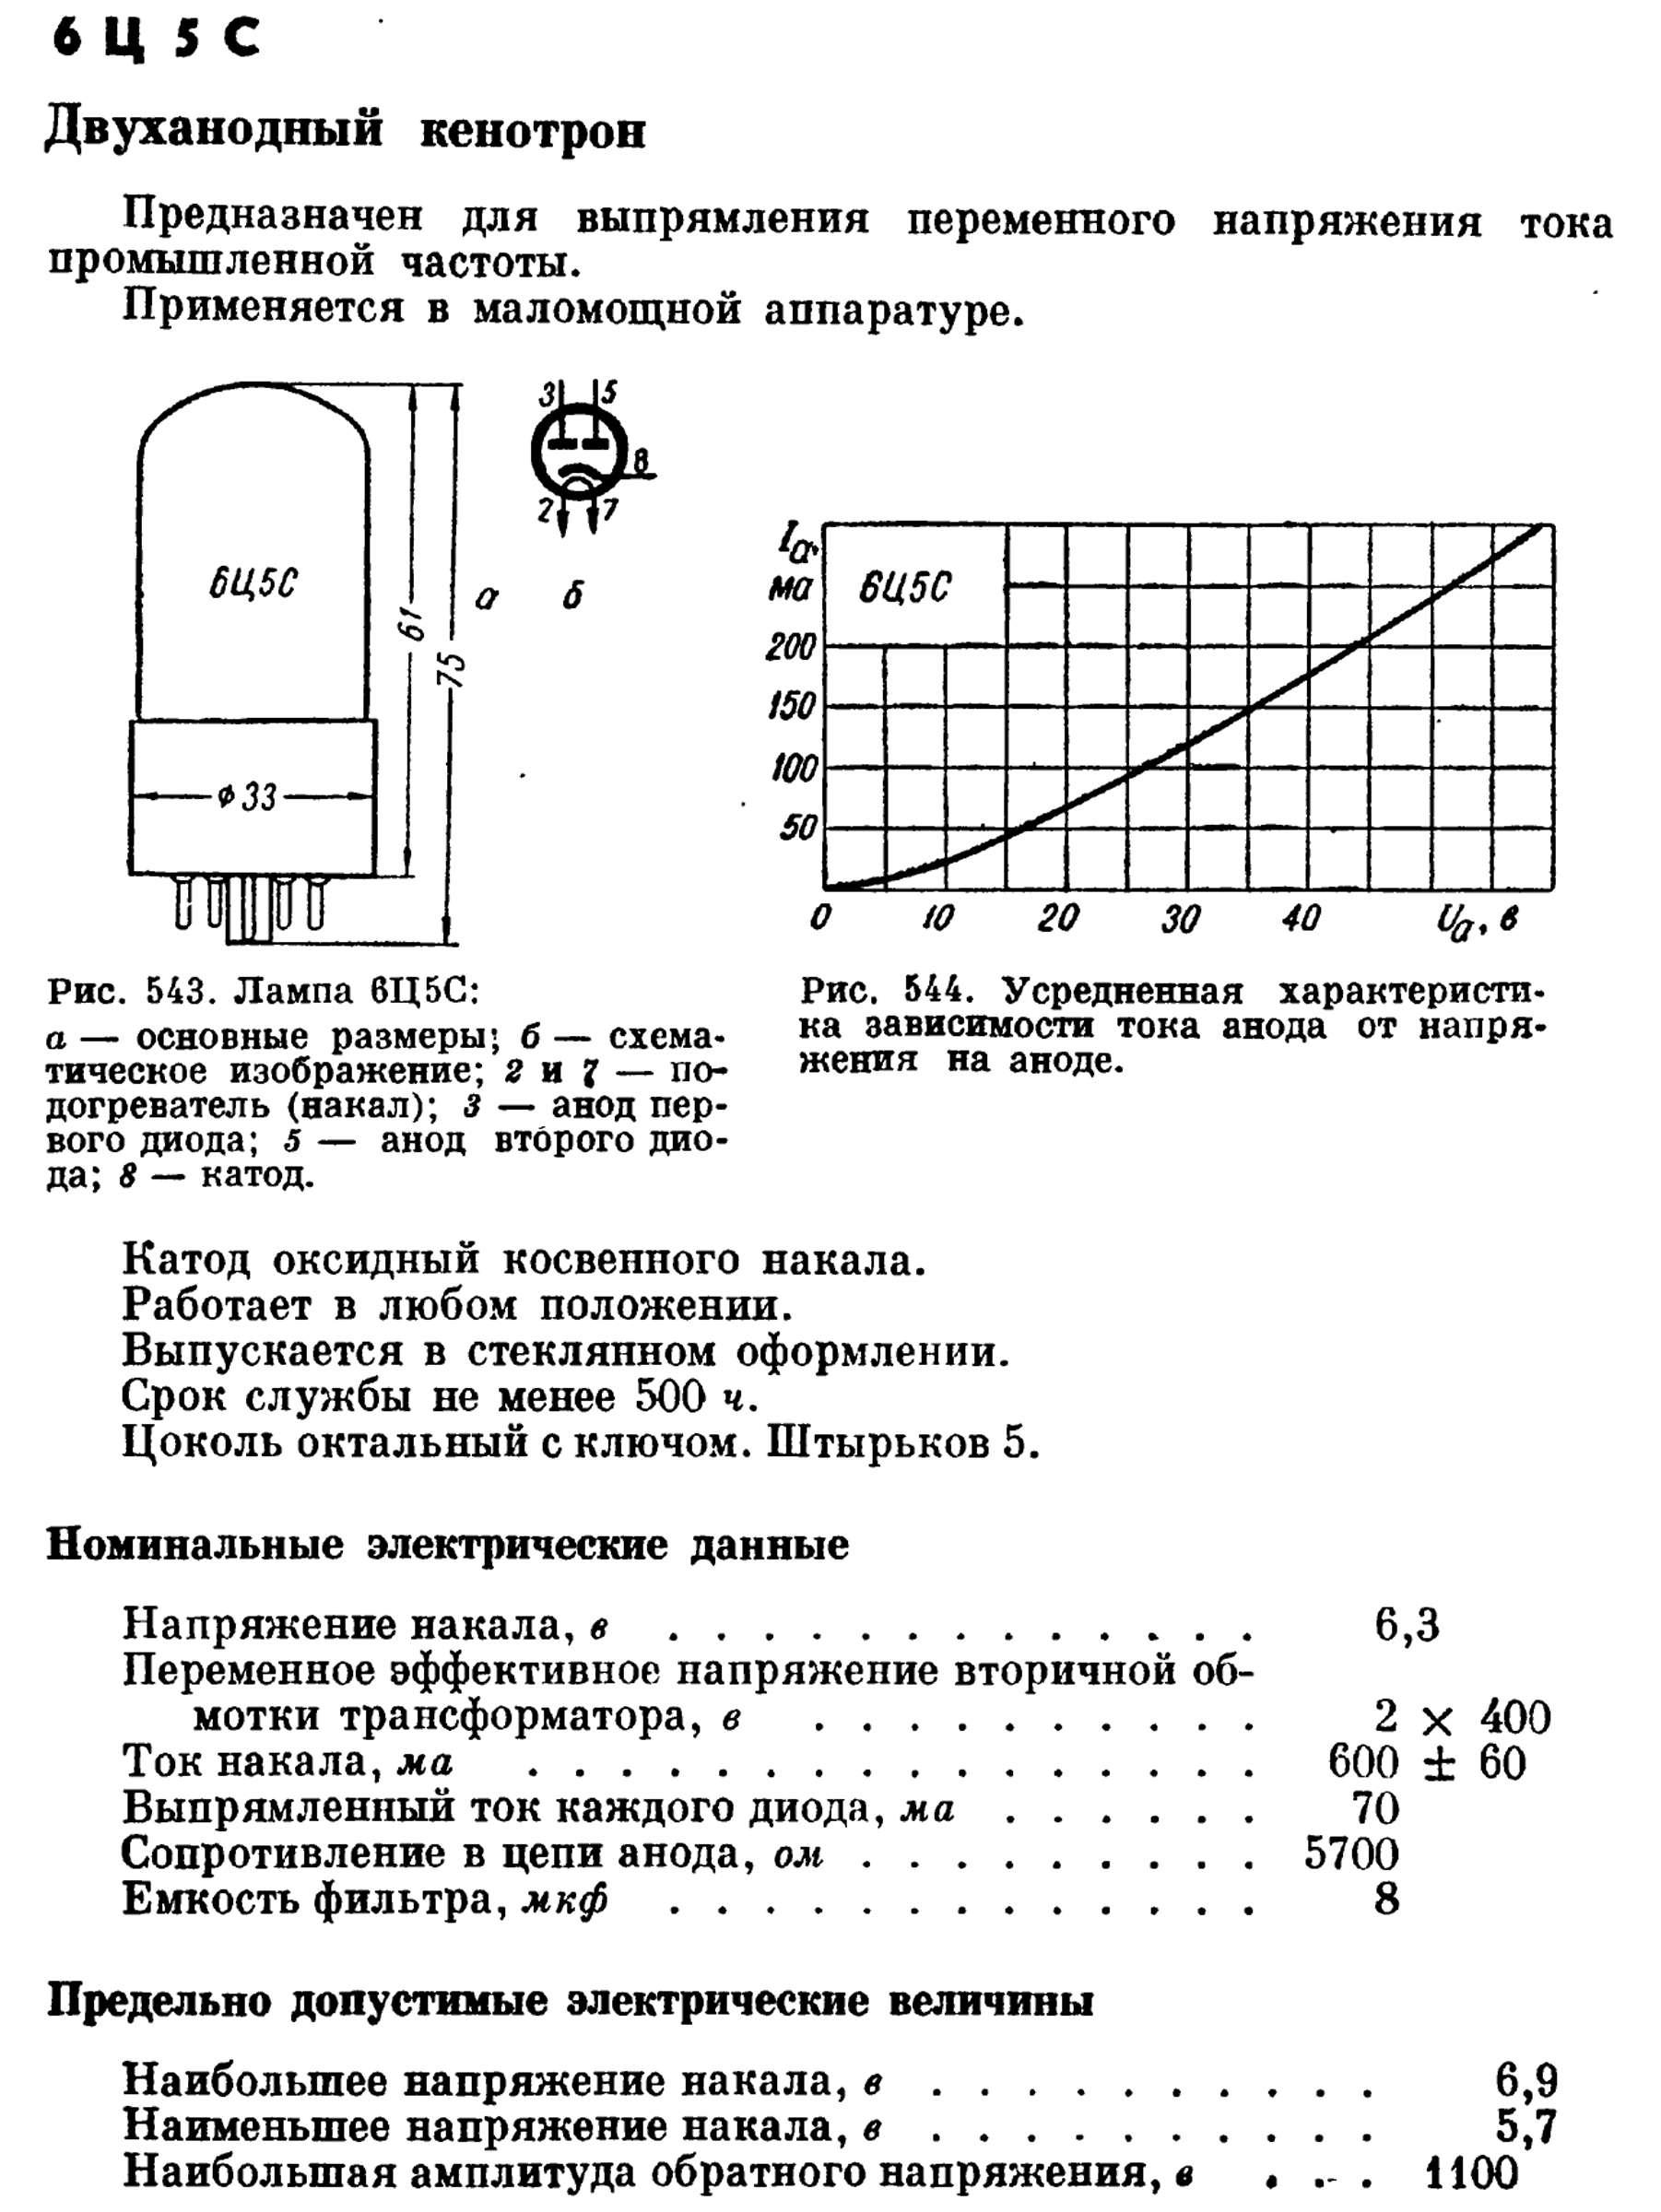 Параметры радиолампы 6Ц5С